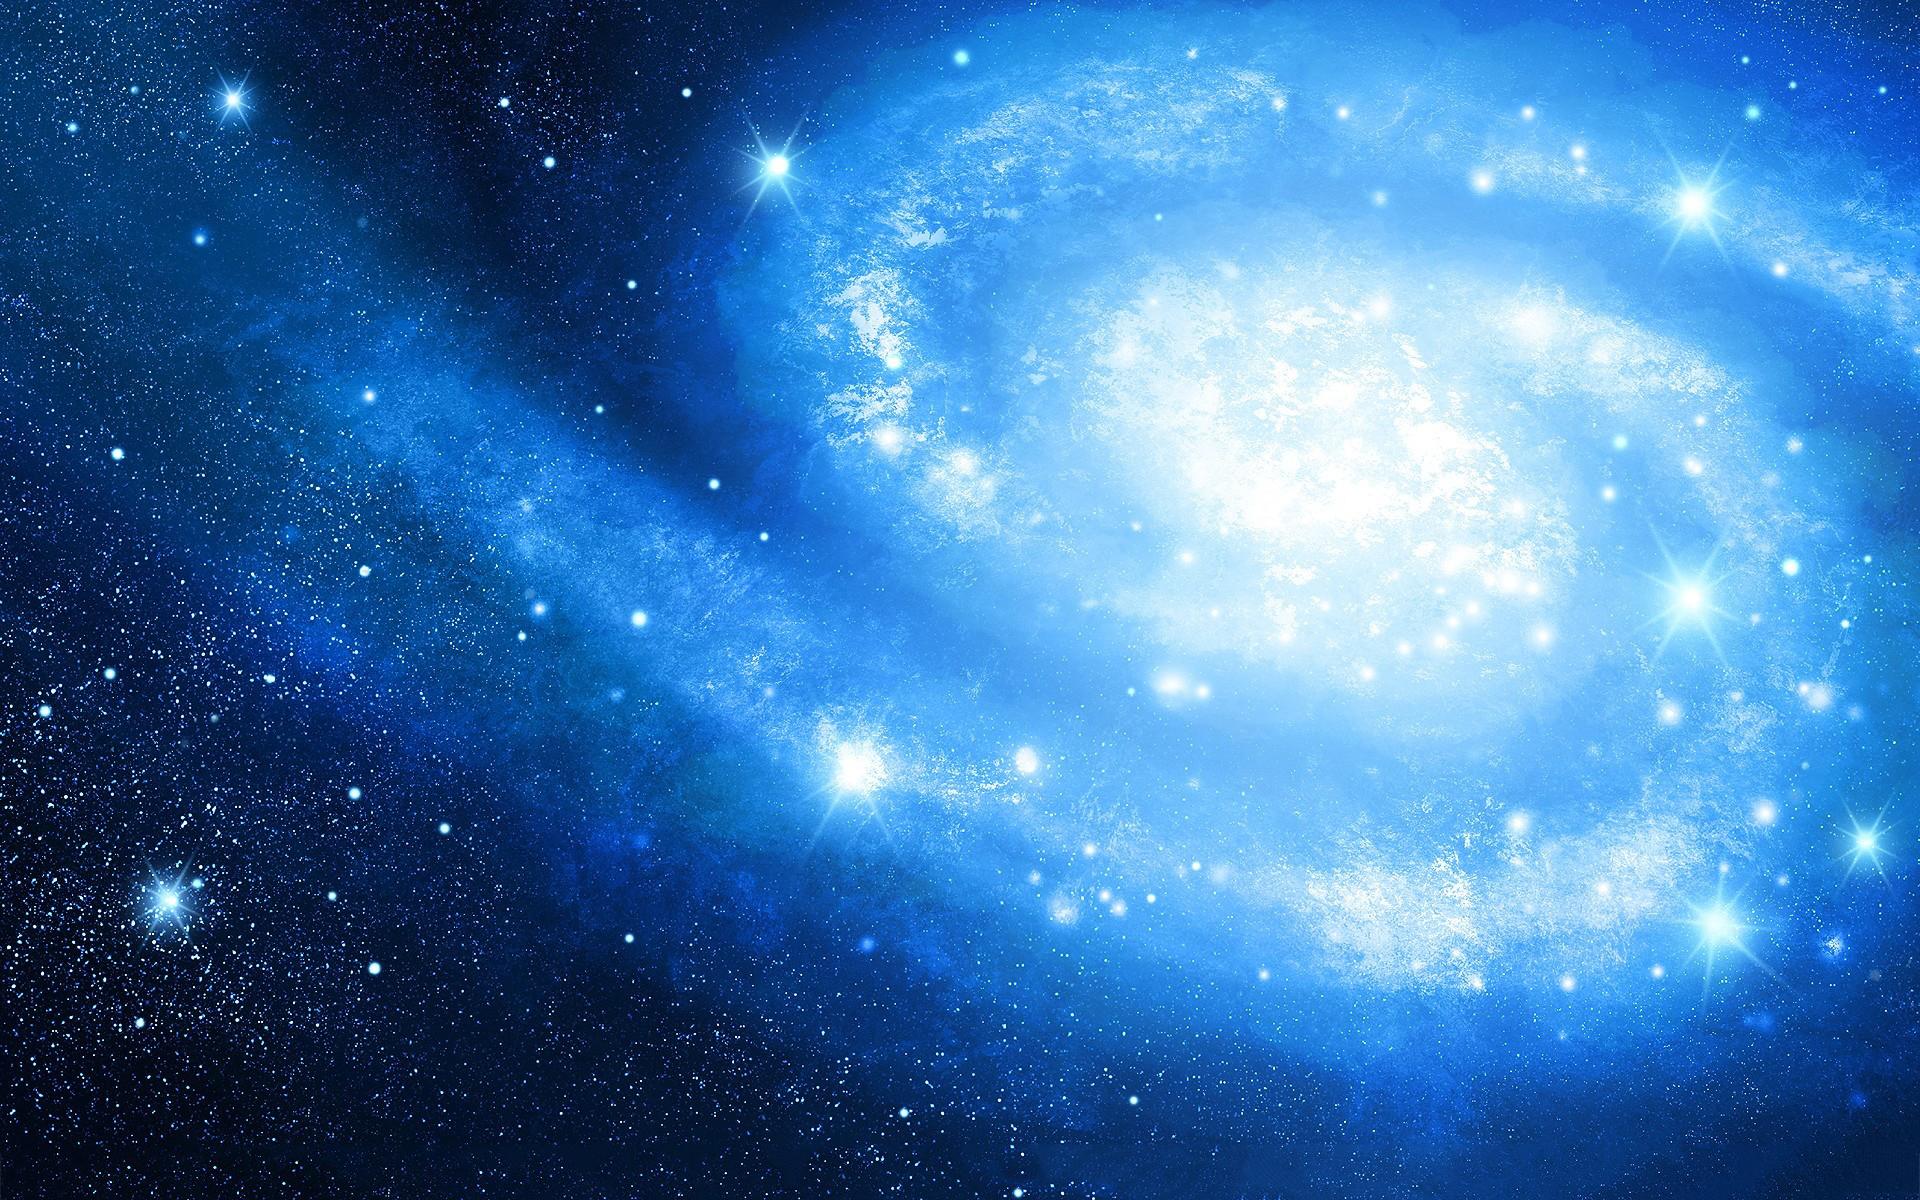 Blue space wallpaper hd wallpapersafari - Blue space hd ...